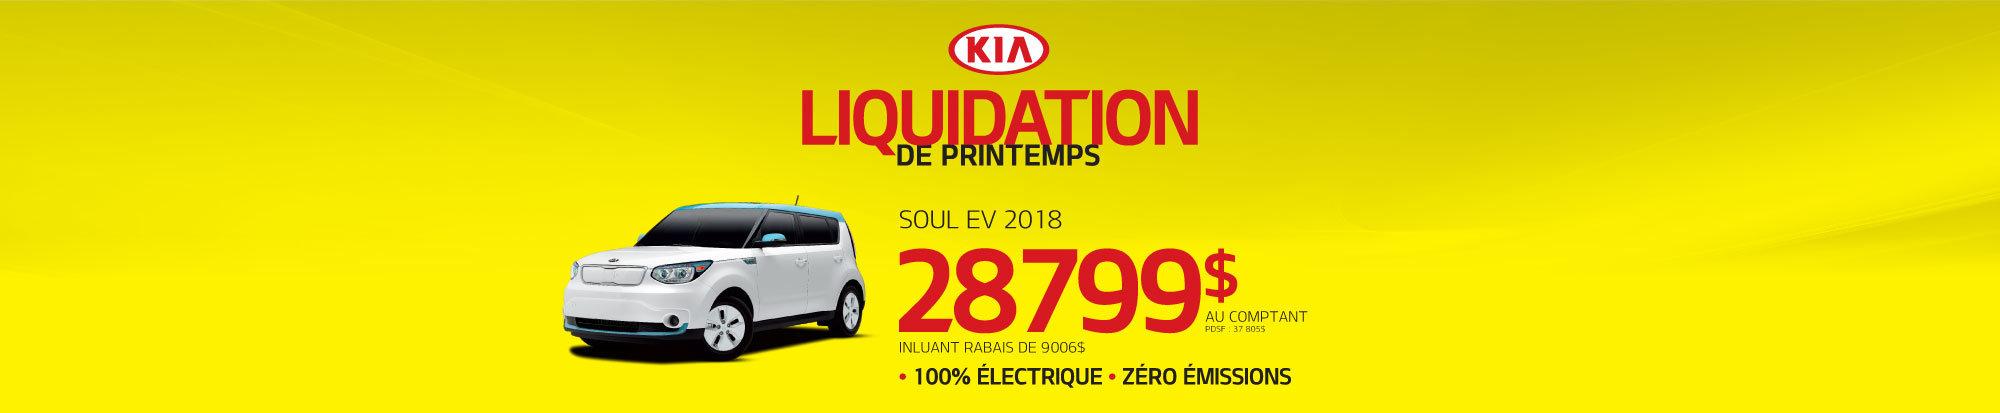 Liquidation de printemps Soul EV 2018 web